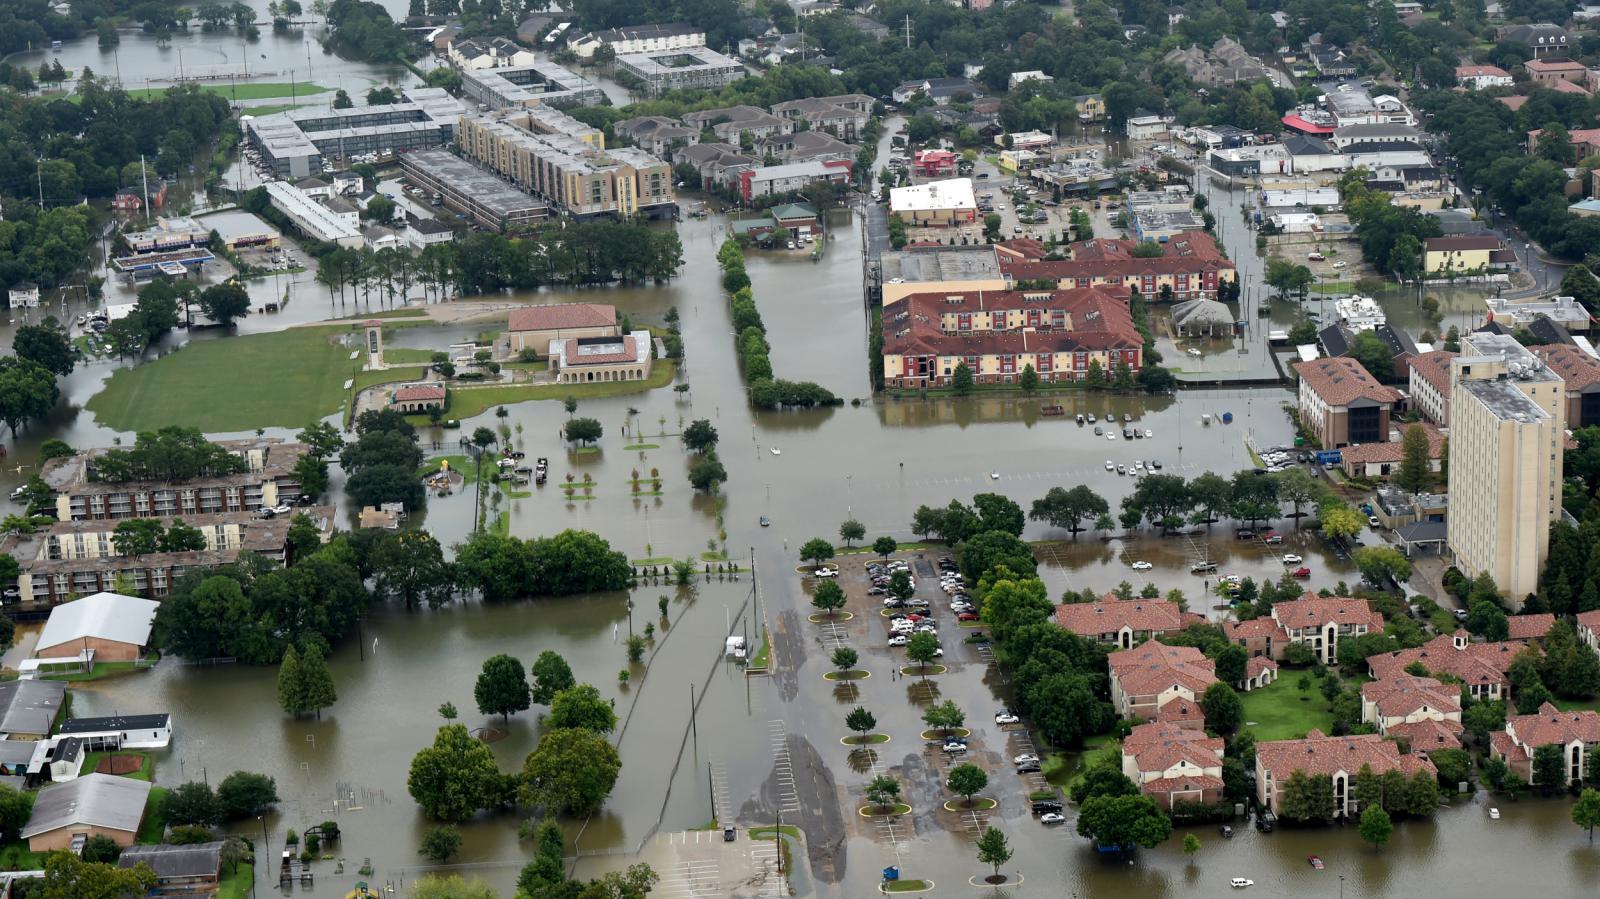 Zaplavené Baton Rouge v Louisianě